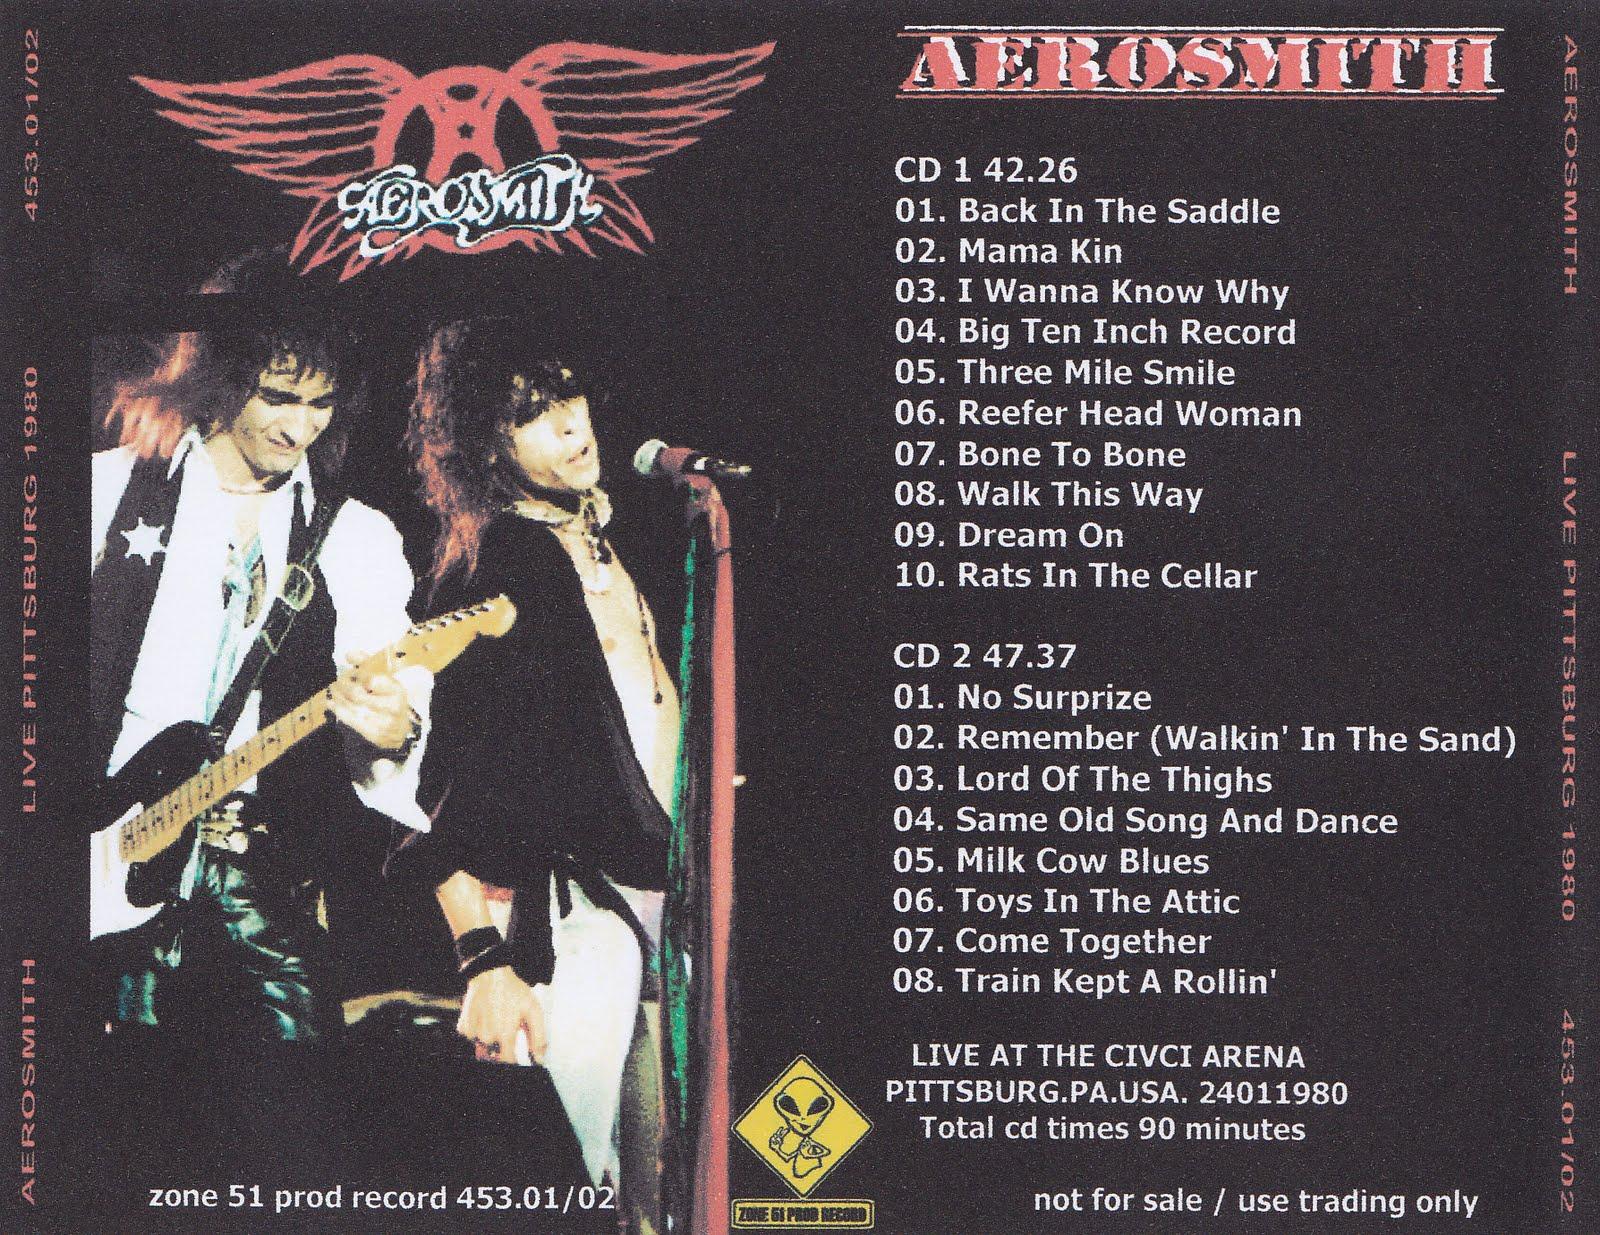 Aerosmith Bootlegs Cover Arts Live Pittsburg 1980